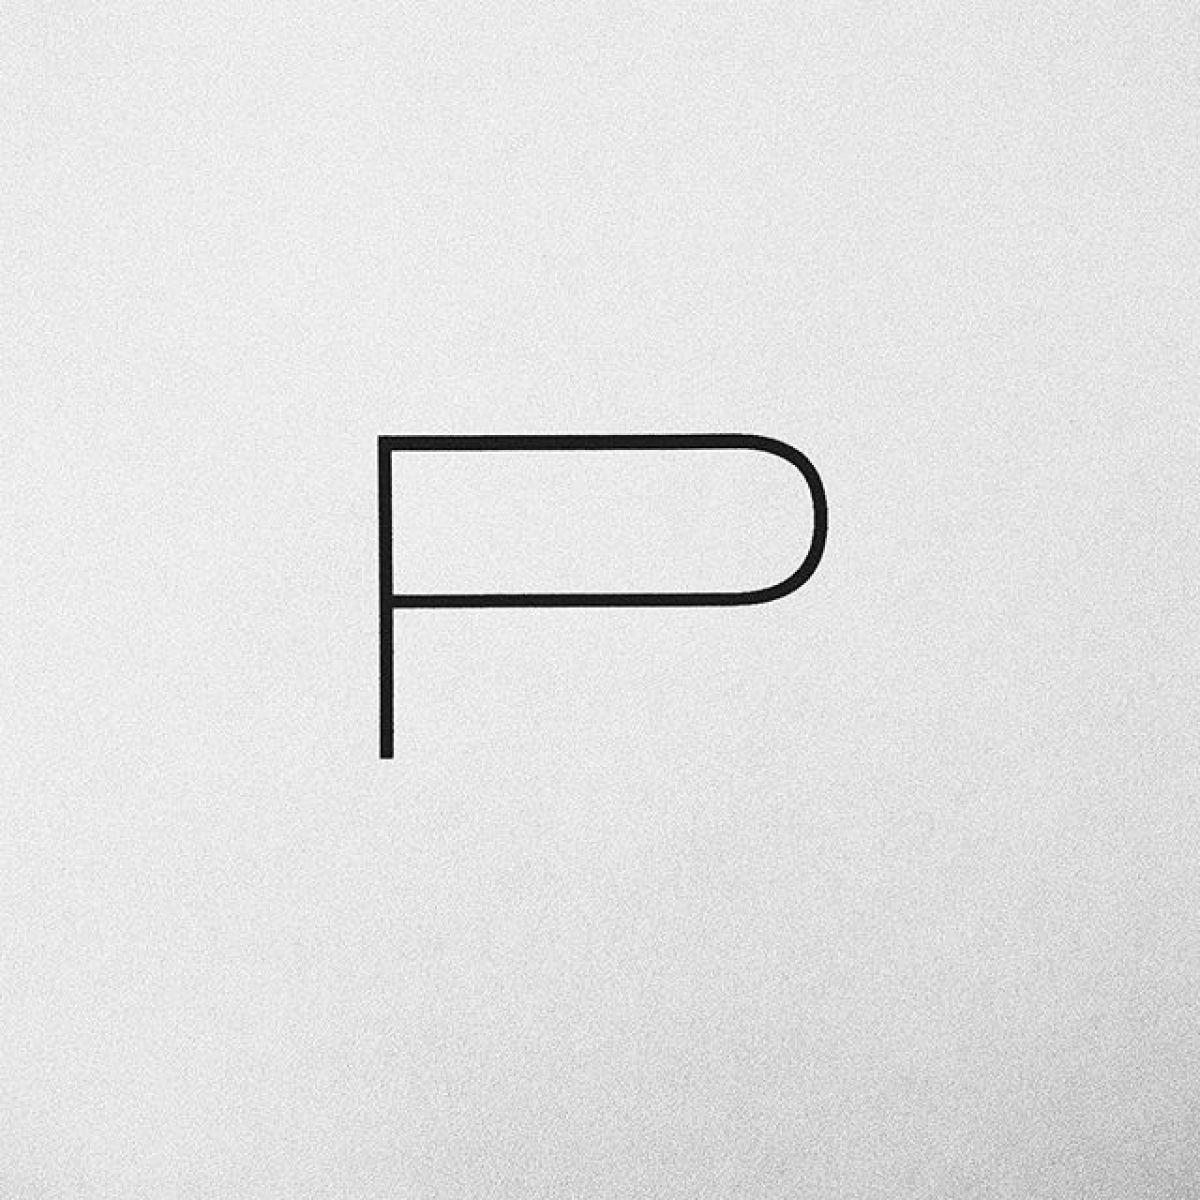 New Work — Coming Soon.Brand Identity.#Brand #Branding #Design #Graphicdesign #British #logo #logos #brands #NewRelease #contemporary #dorset #london #graphicdesigner #graphicdesign #designagency #brandingagency